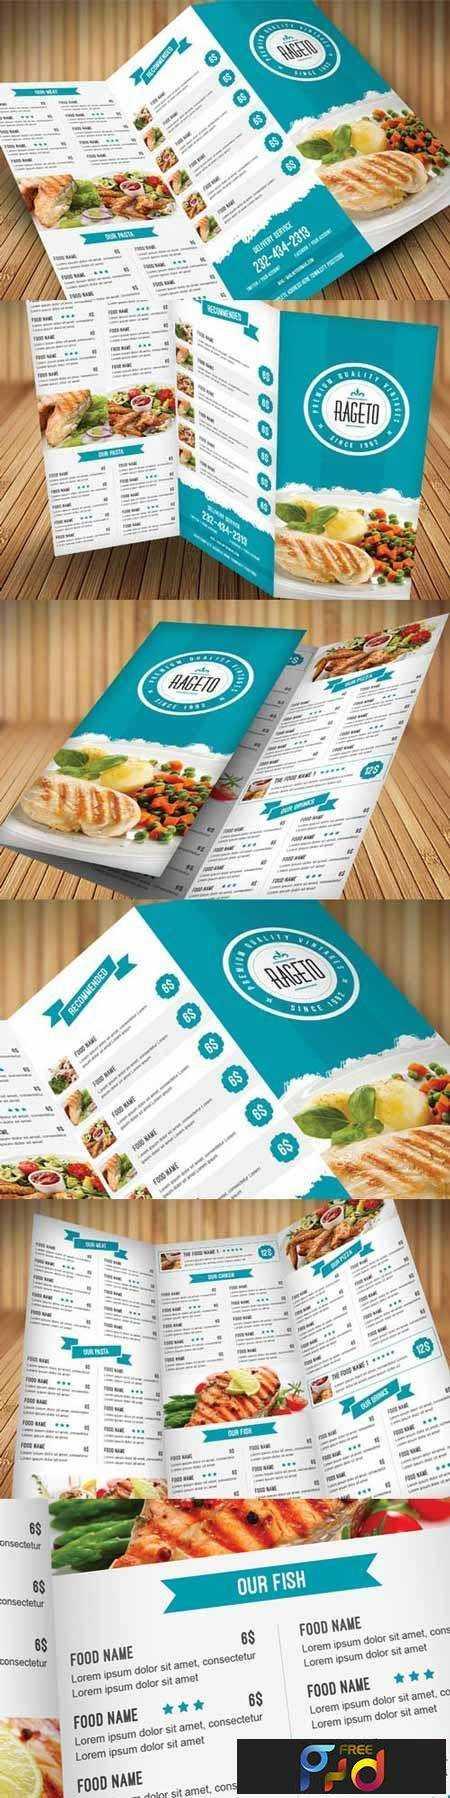 freepsdvn-com_1442609118_clean-food-menu-364376